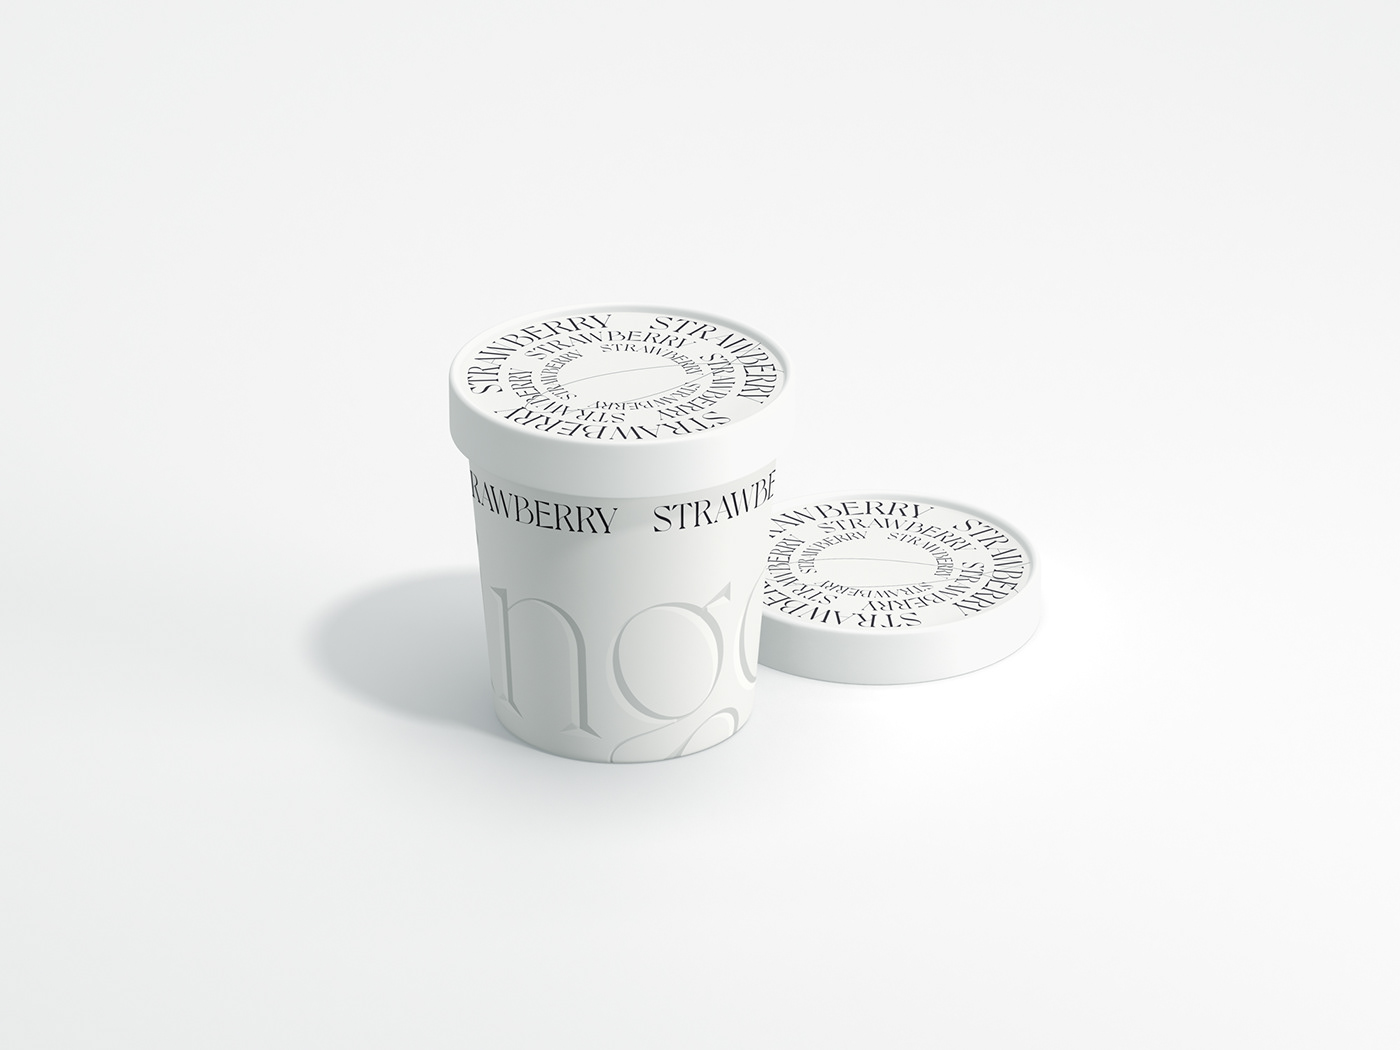 Image may contain: tableware, cup and mug